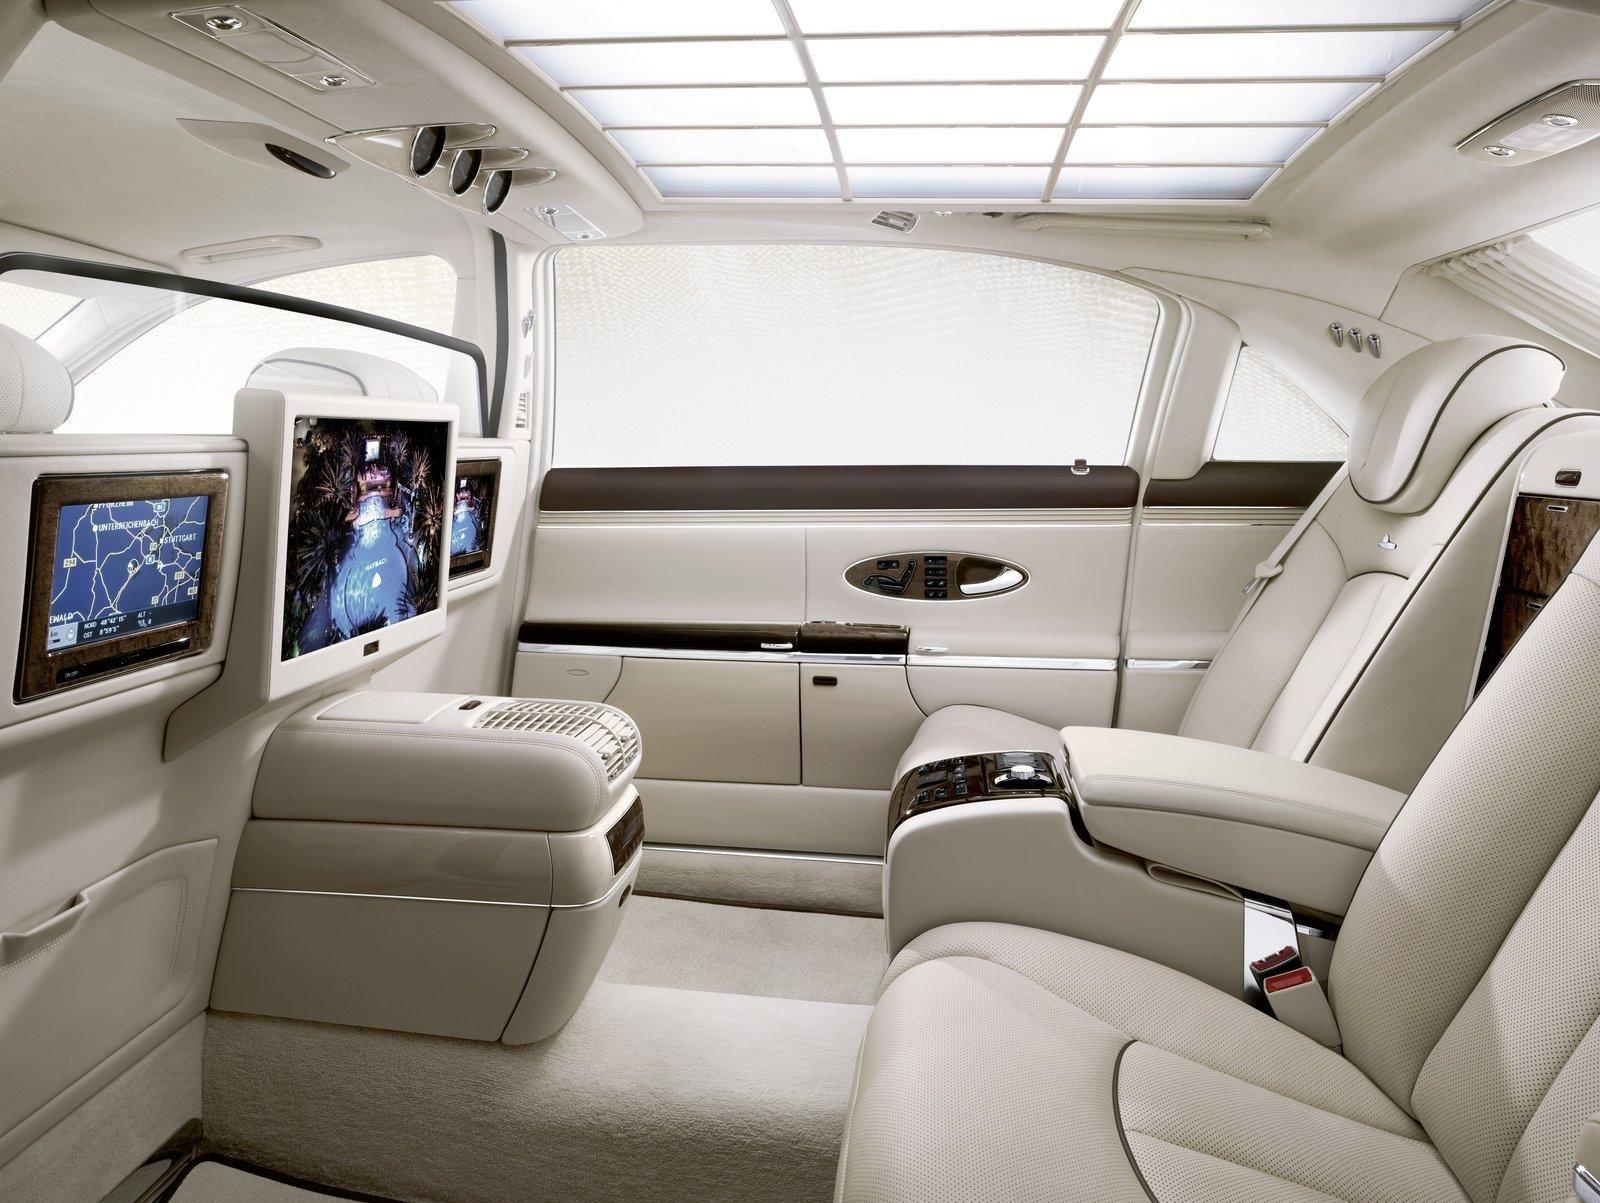 Car interior entertainment - 2011 Maybach 62 S Luxurious Sedan Interior Entertainment